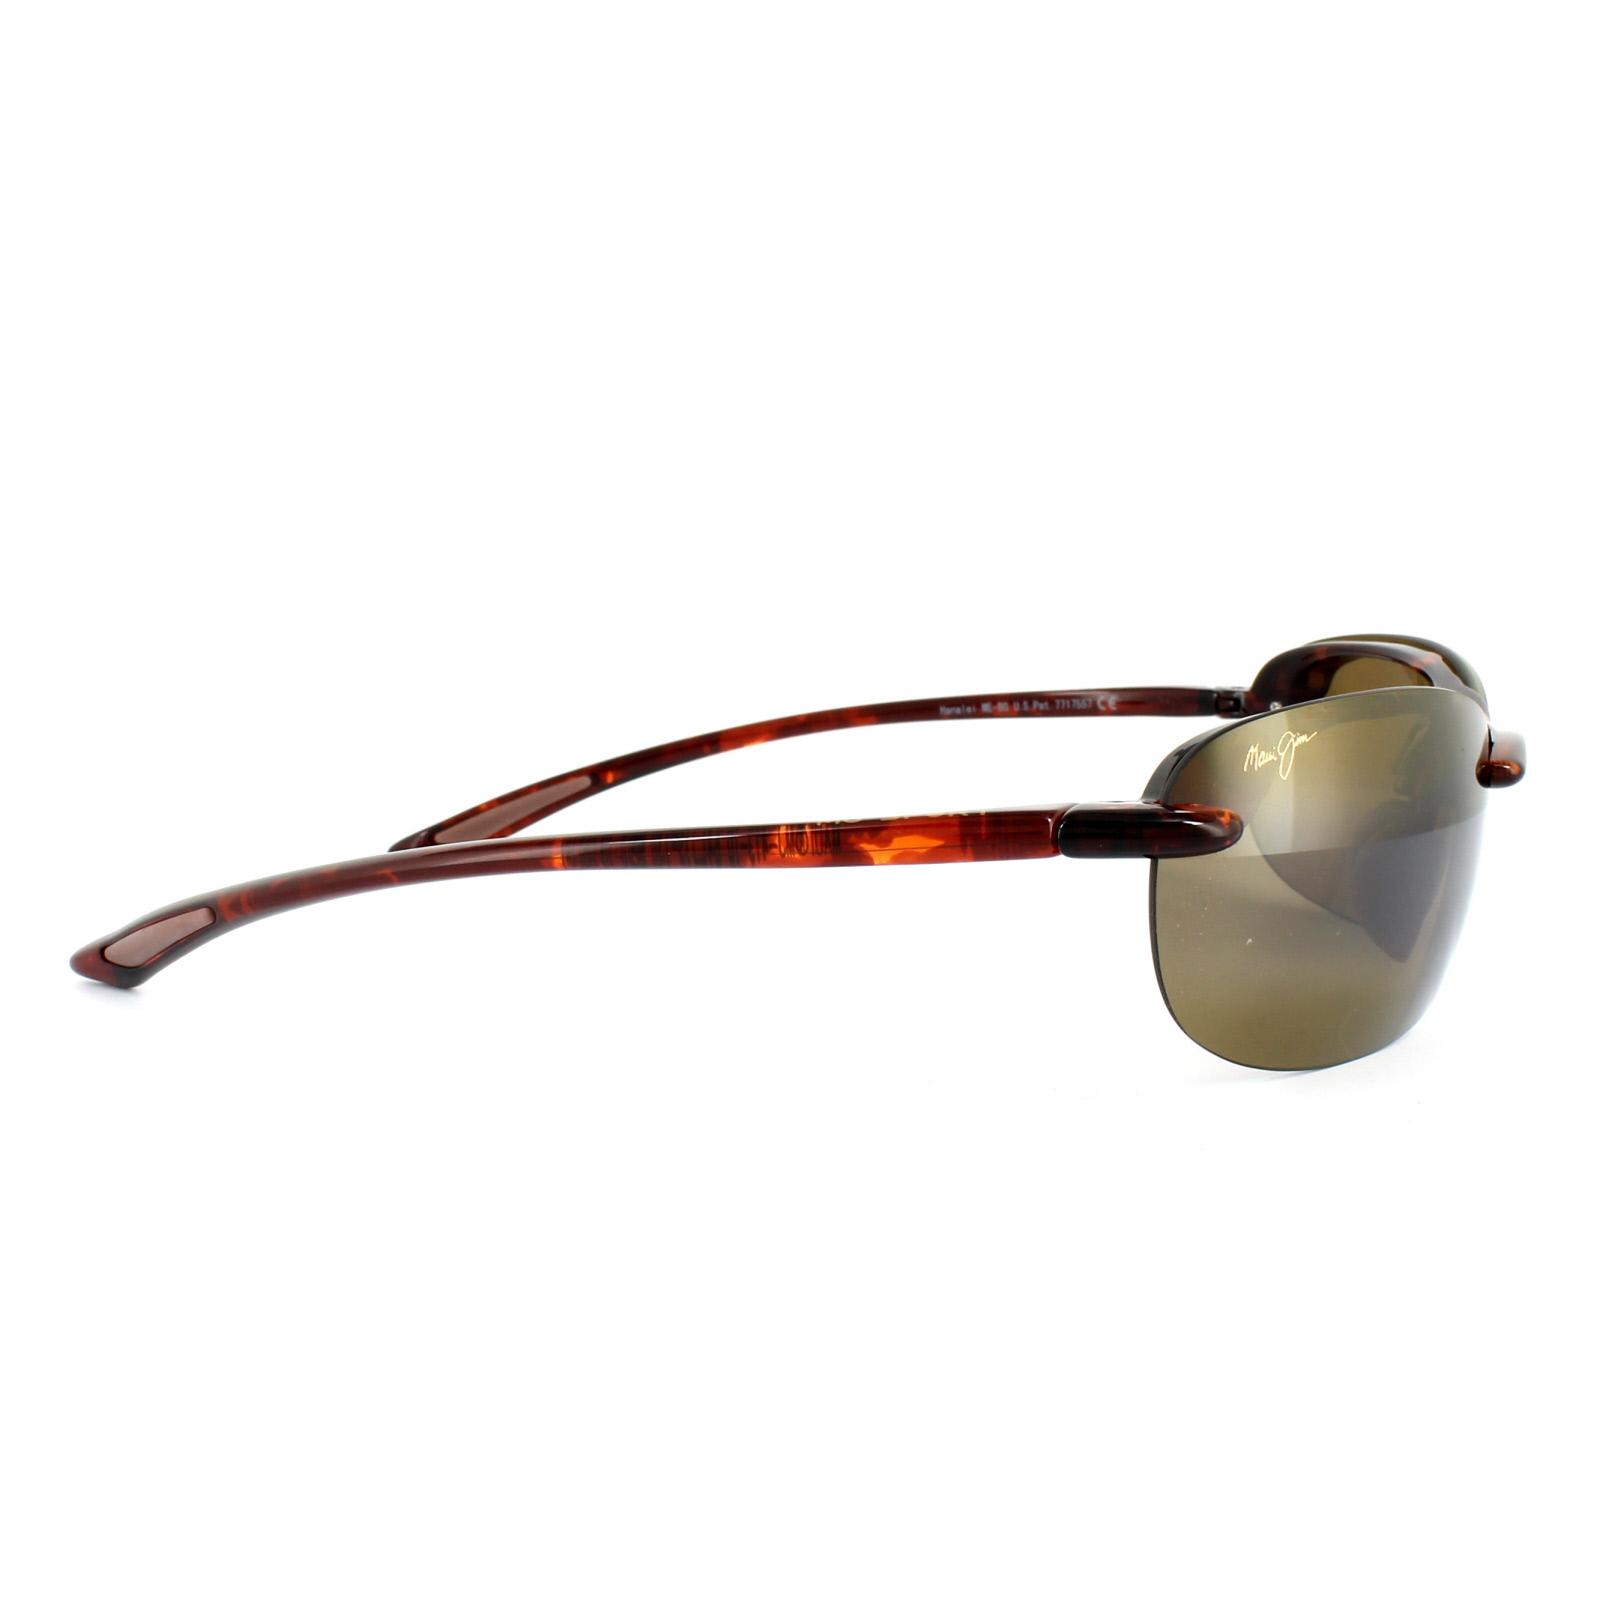 Cheap Maui Jim Hanalei Sunglasses Discounted Sunglasses